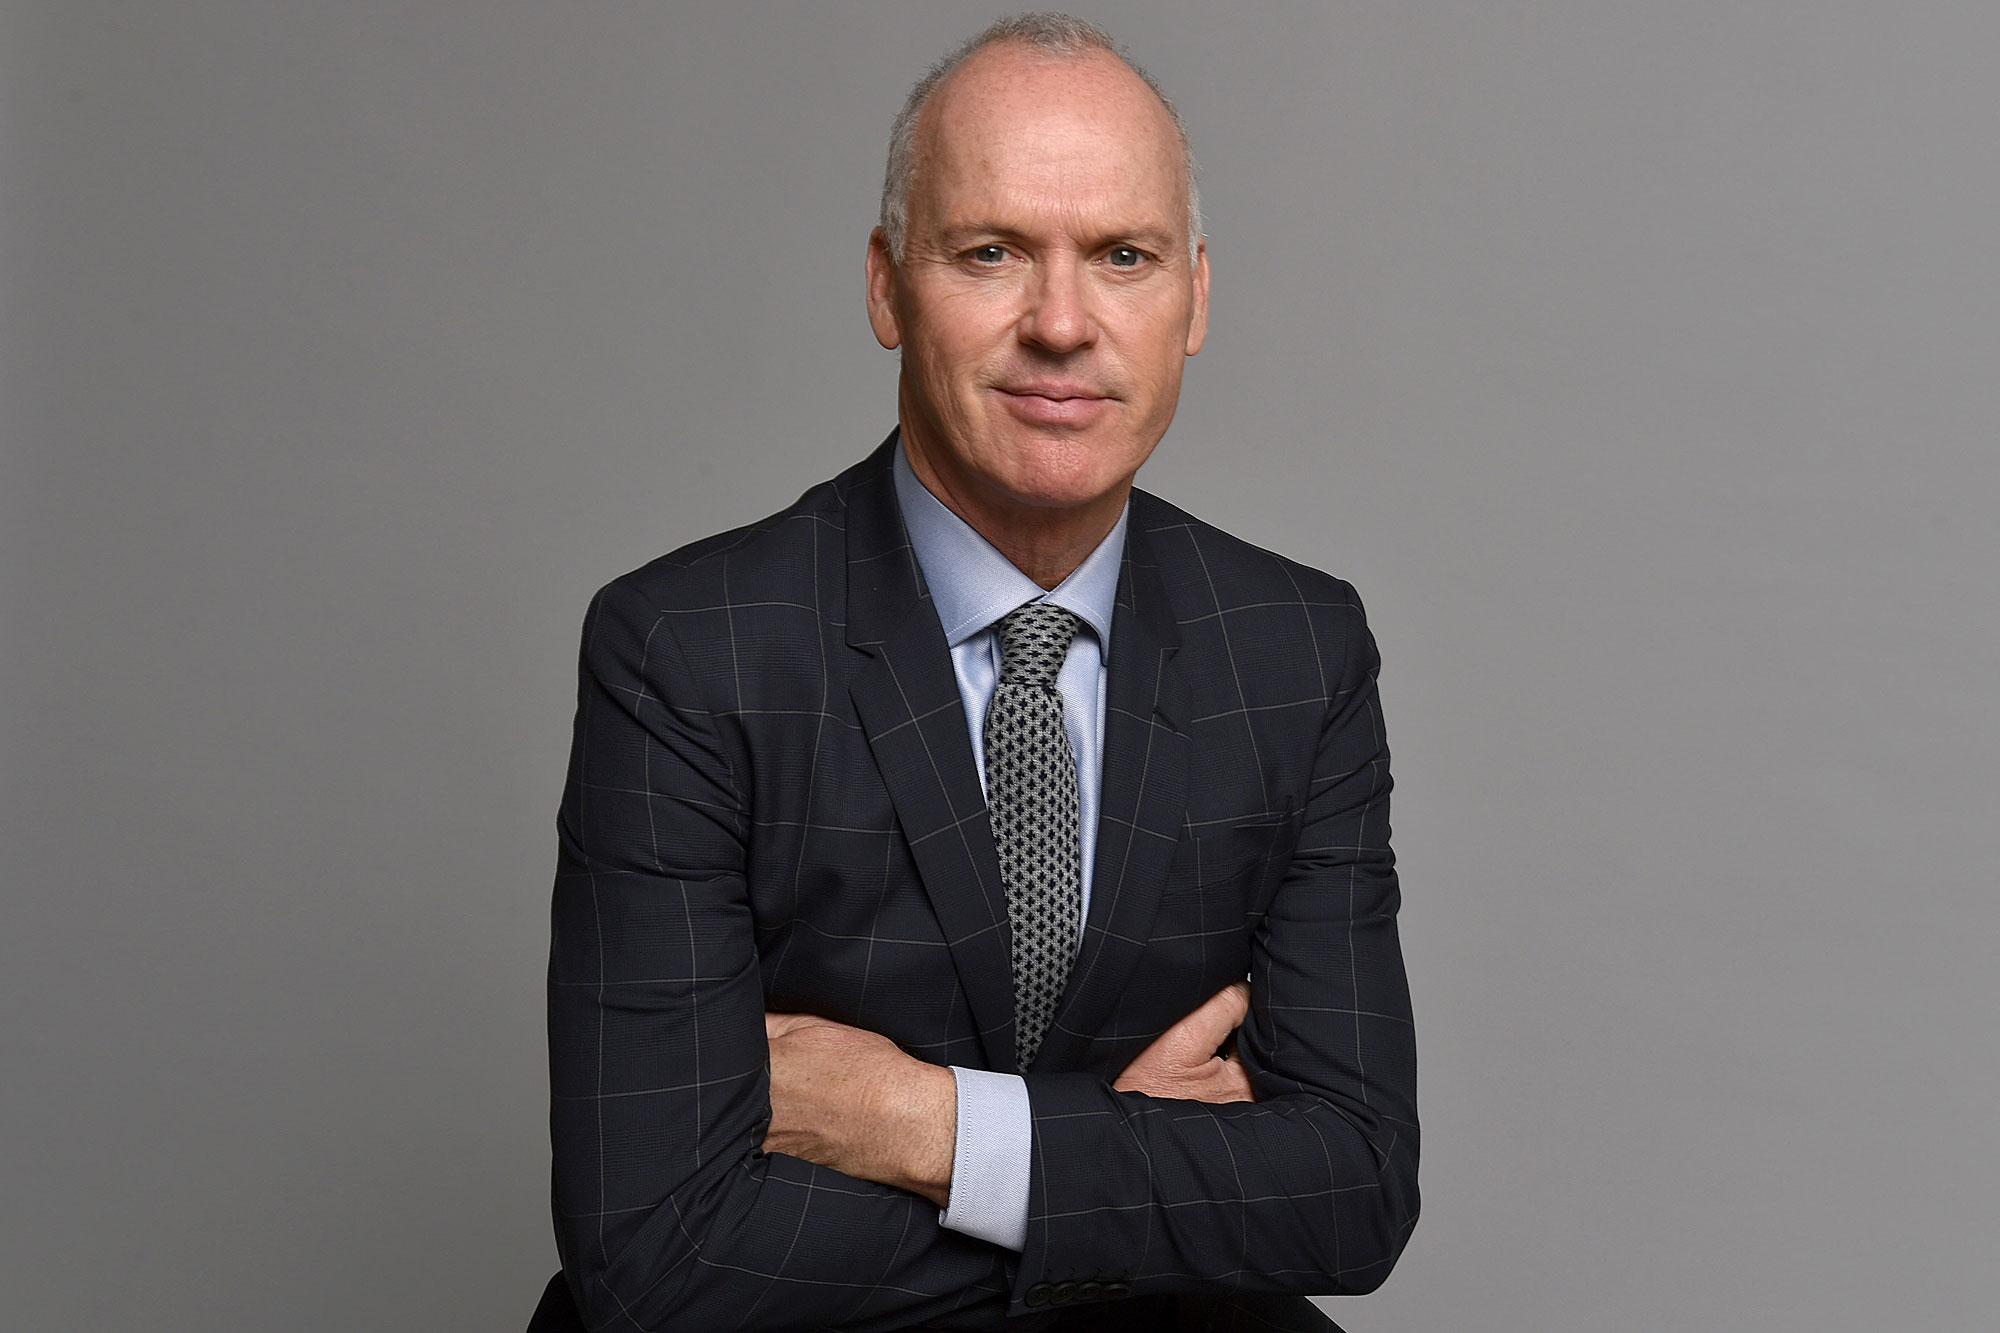 Michael Keaton Image